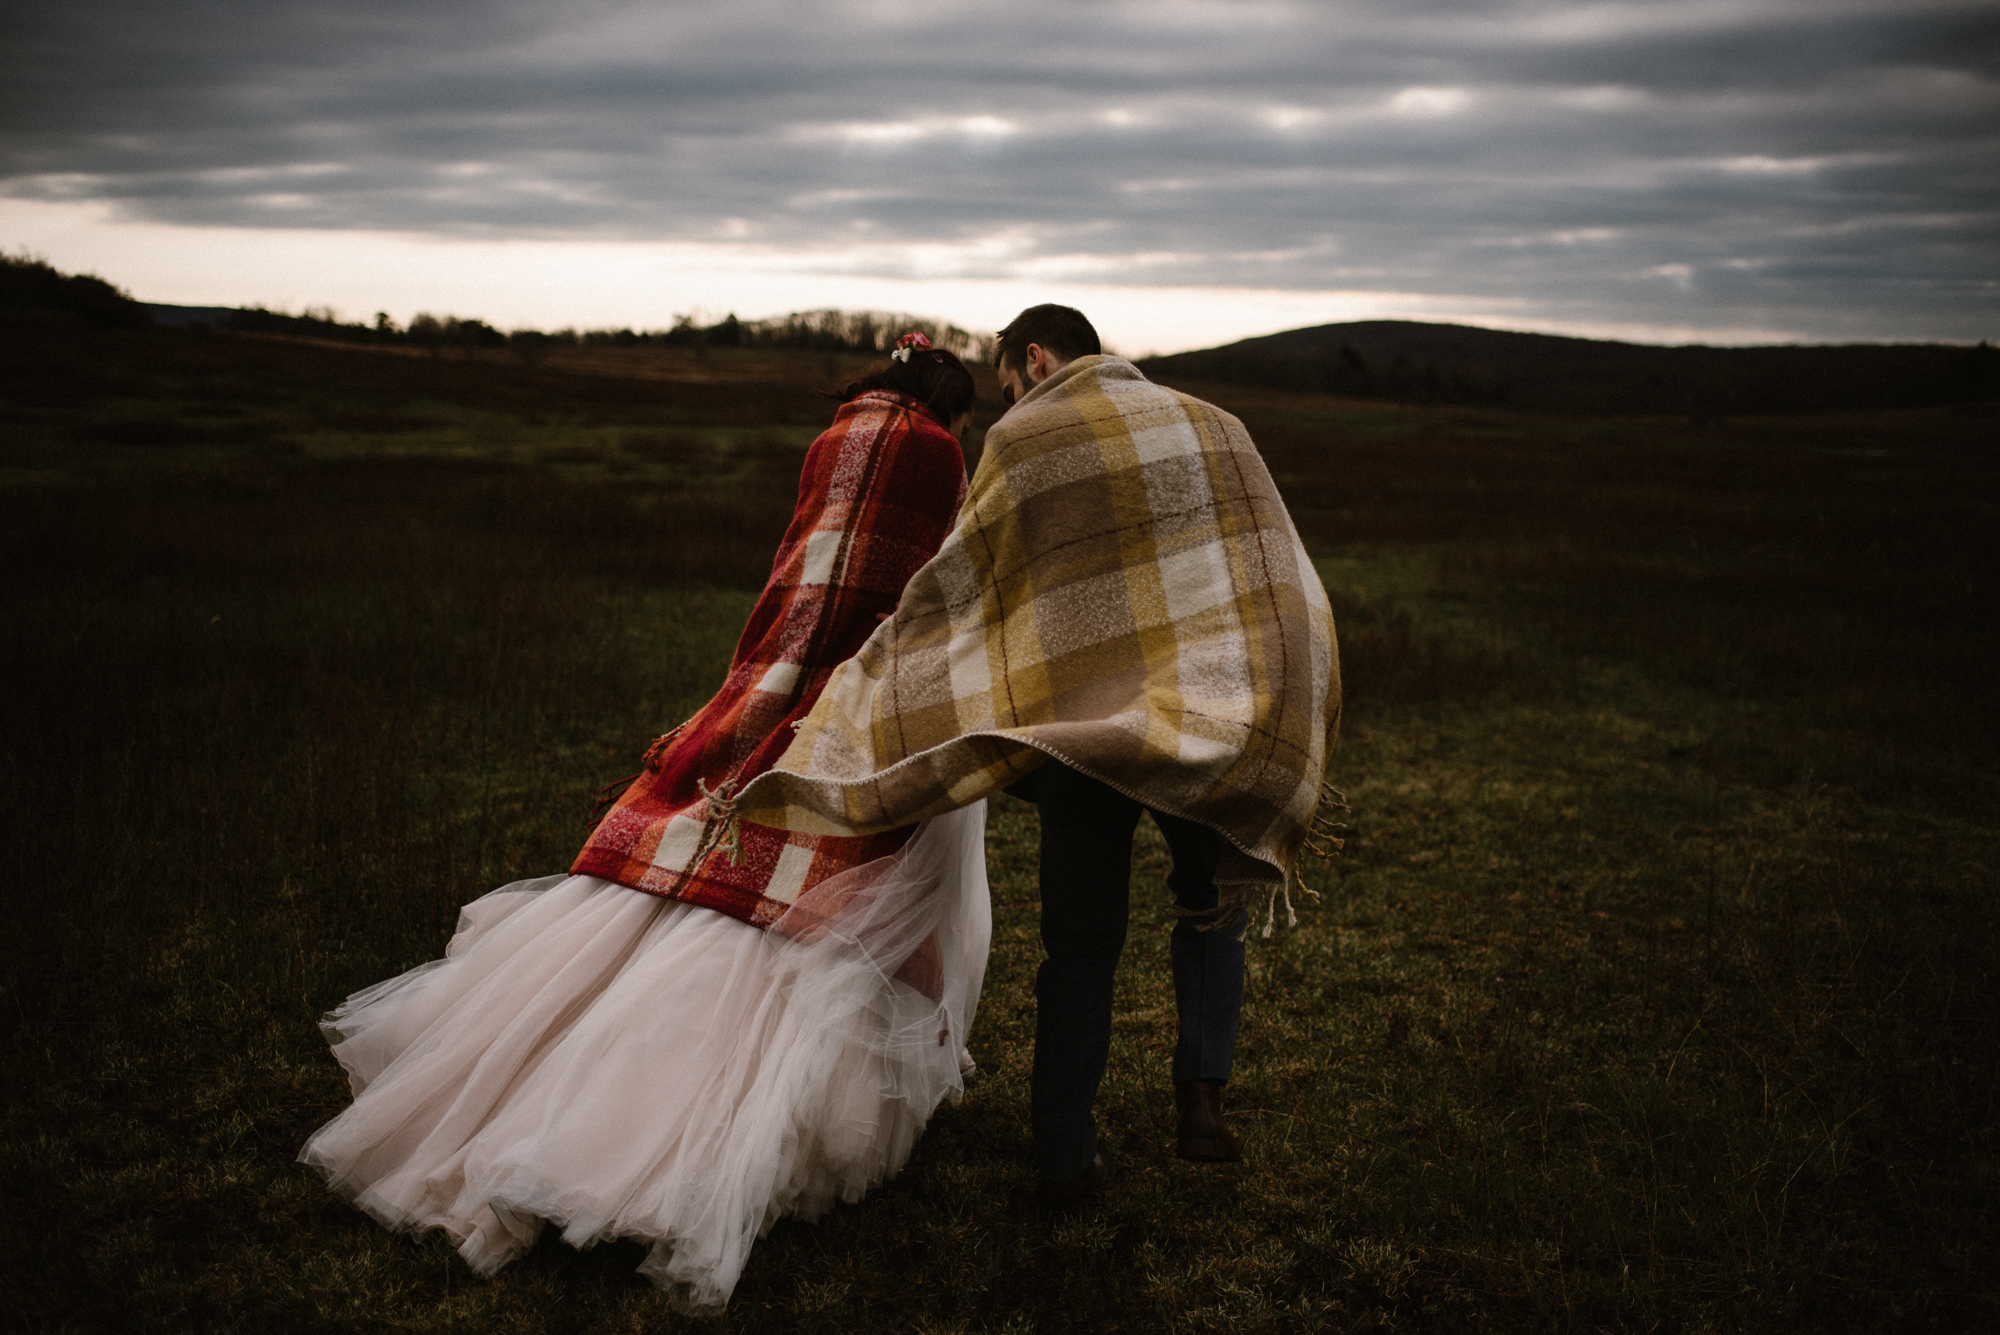 Paula and Andrew - Small Adventurous Wedding in Shenandoah National Park - Blue Ridge Mountain Wedding - White Sails Creative - Mountain Elopement_33.jpg